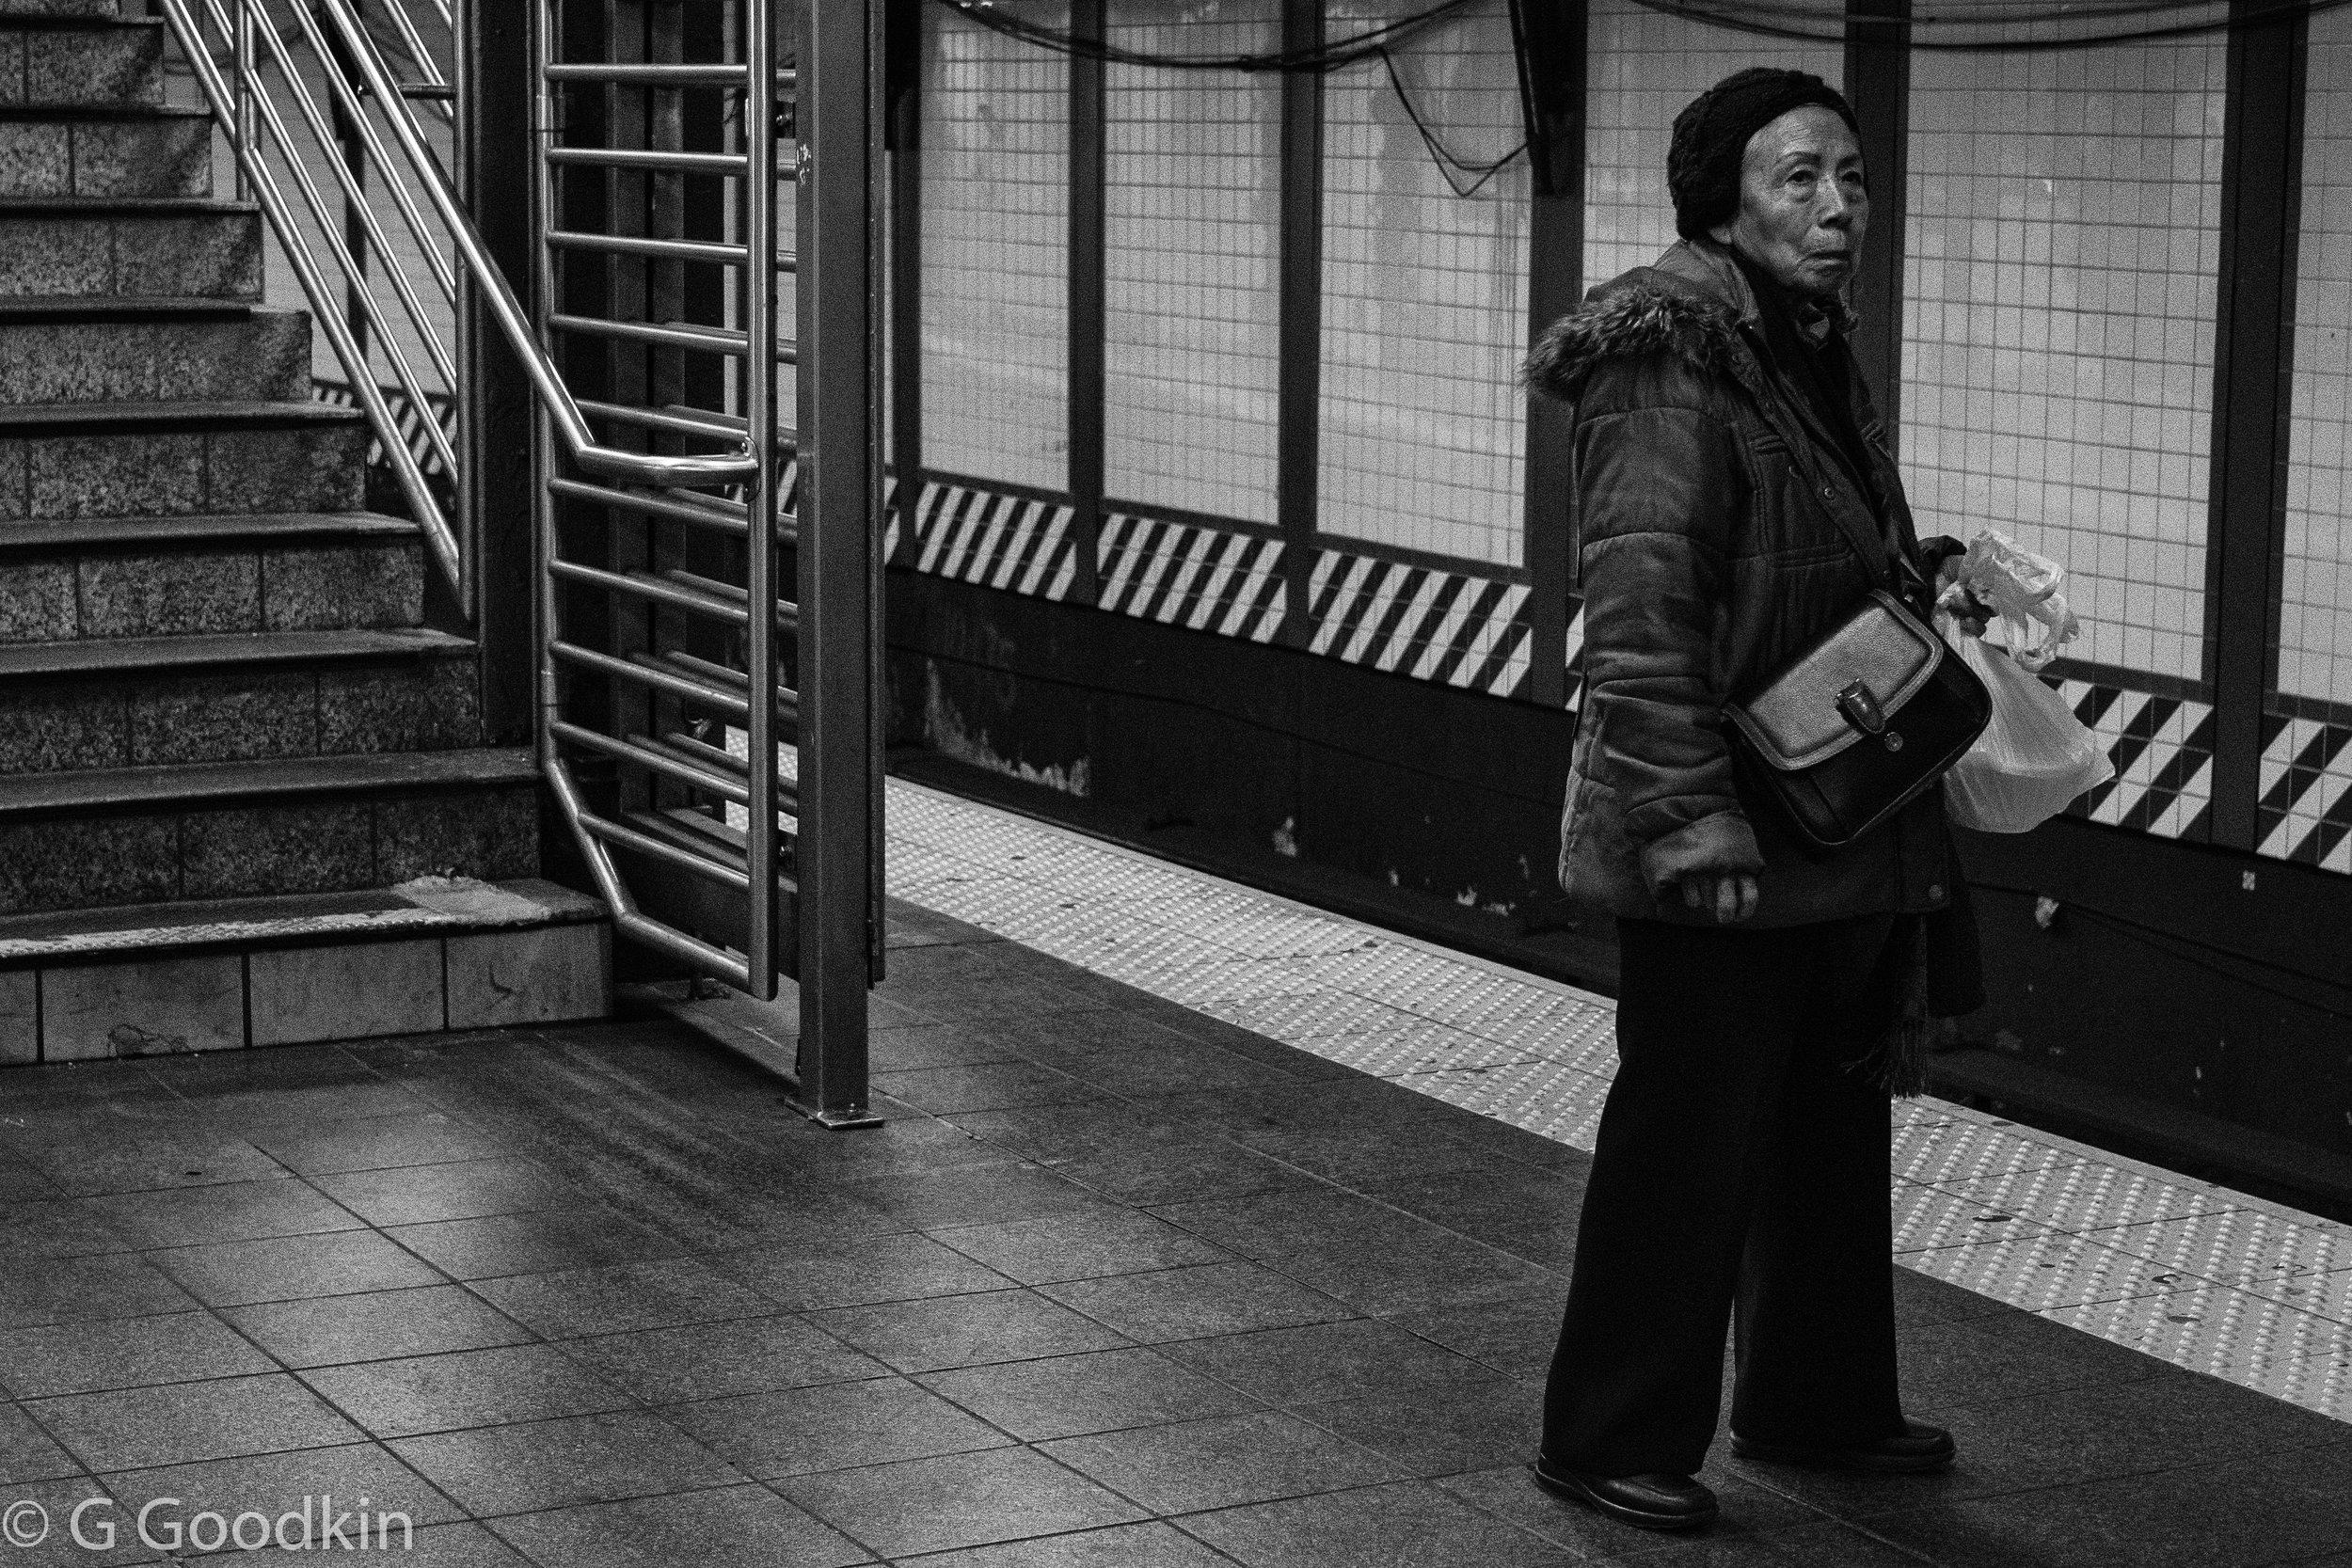 2017-12-03_nyc_street-29bnw.jpg